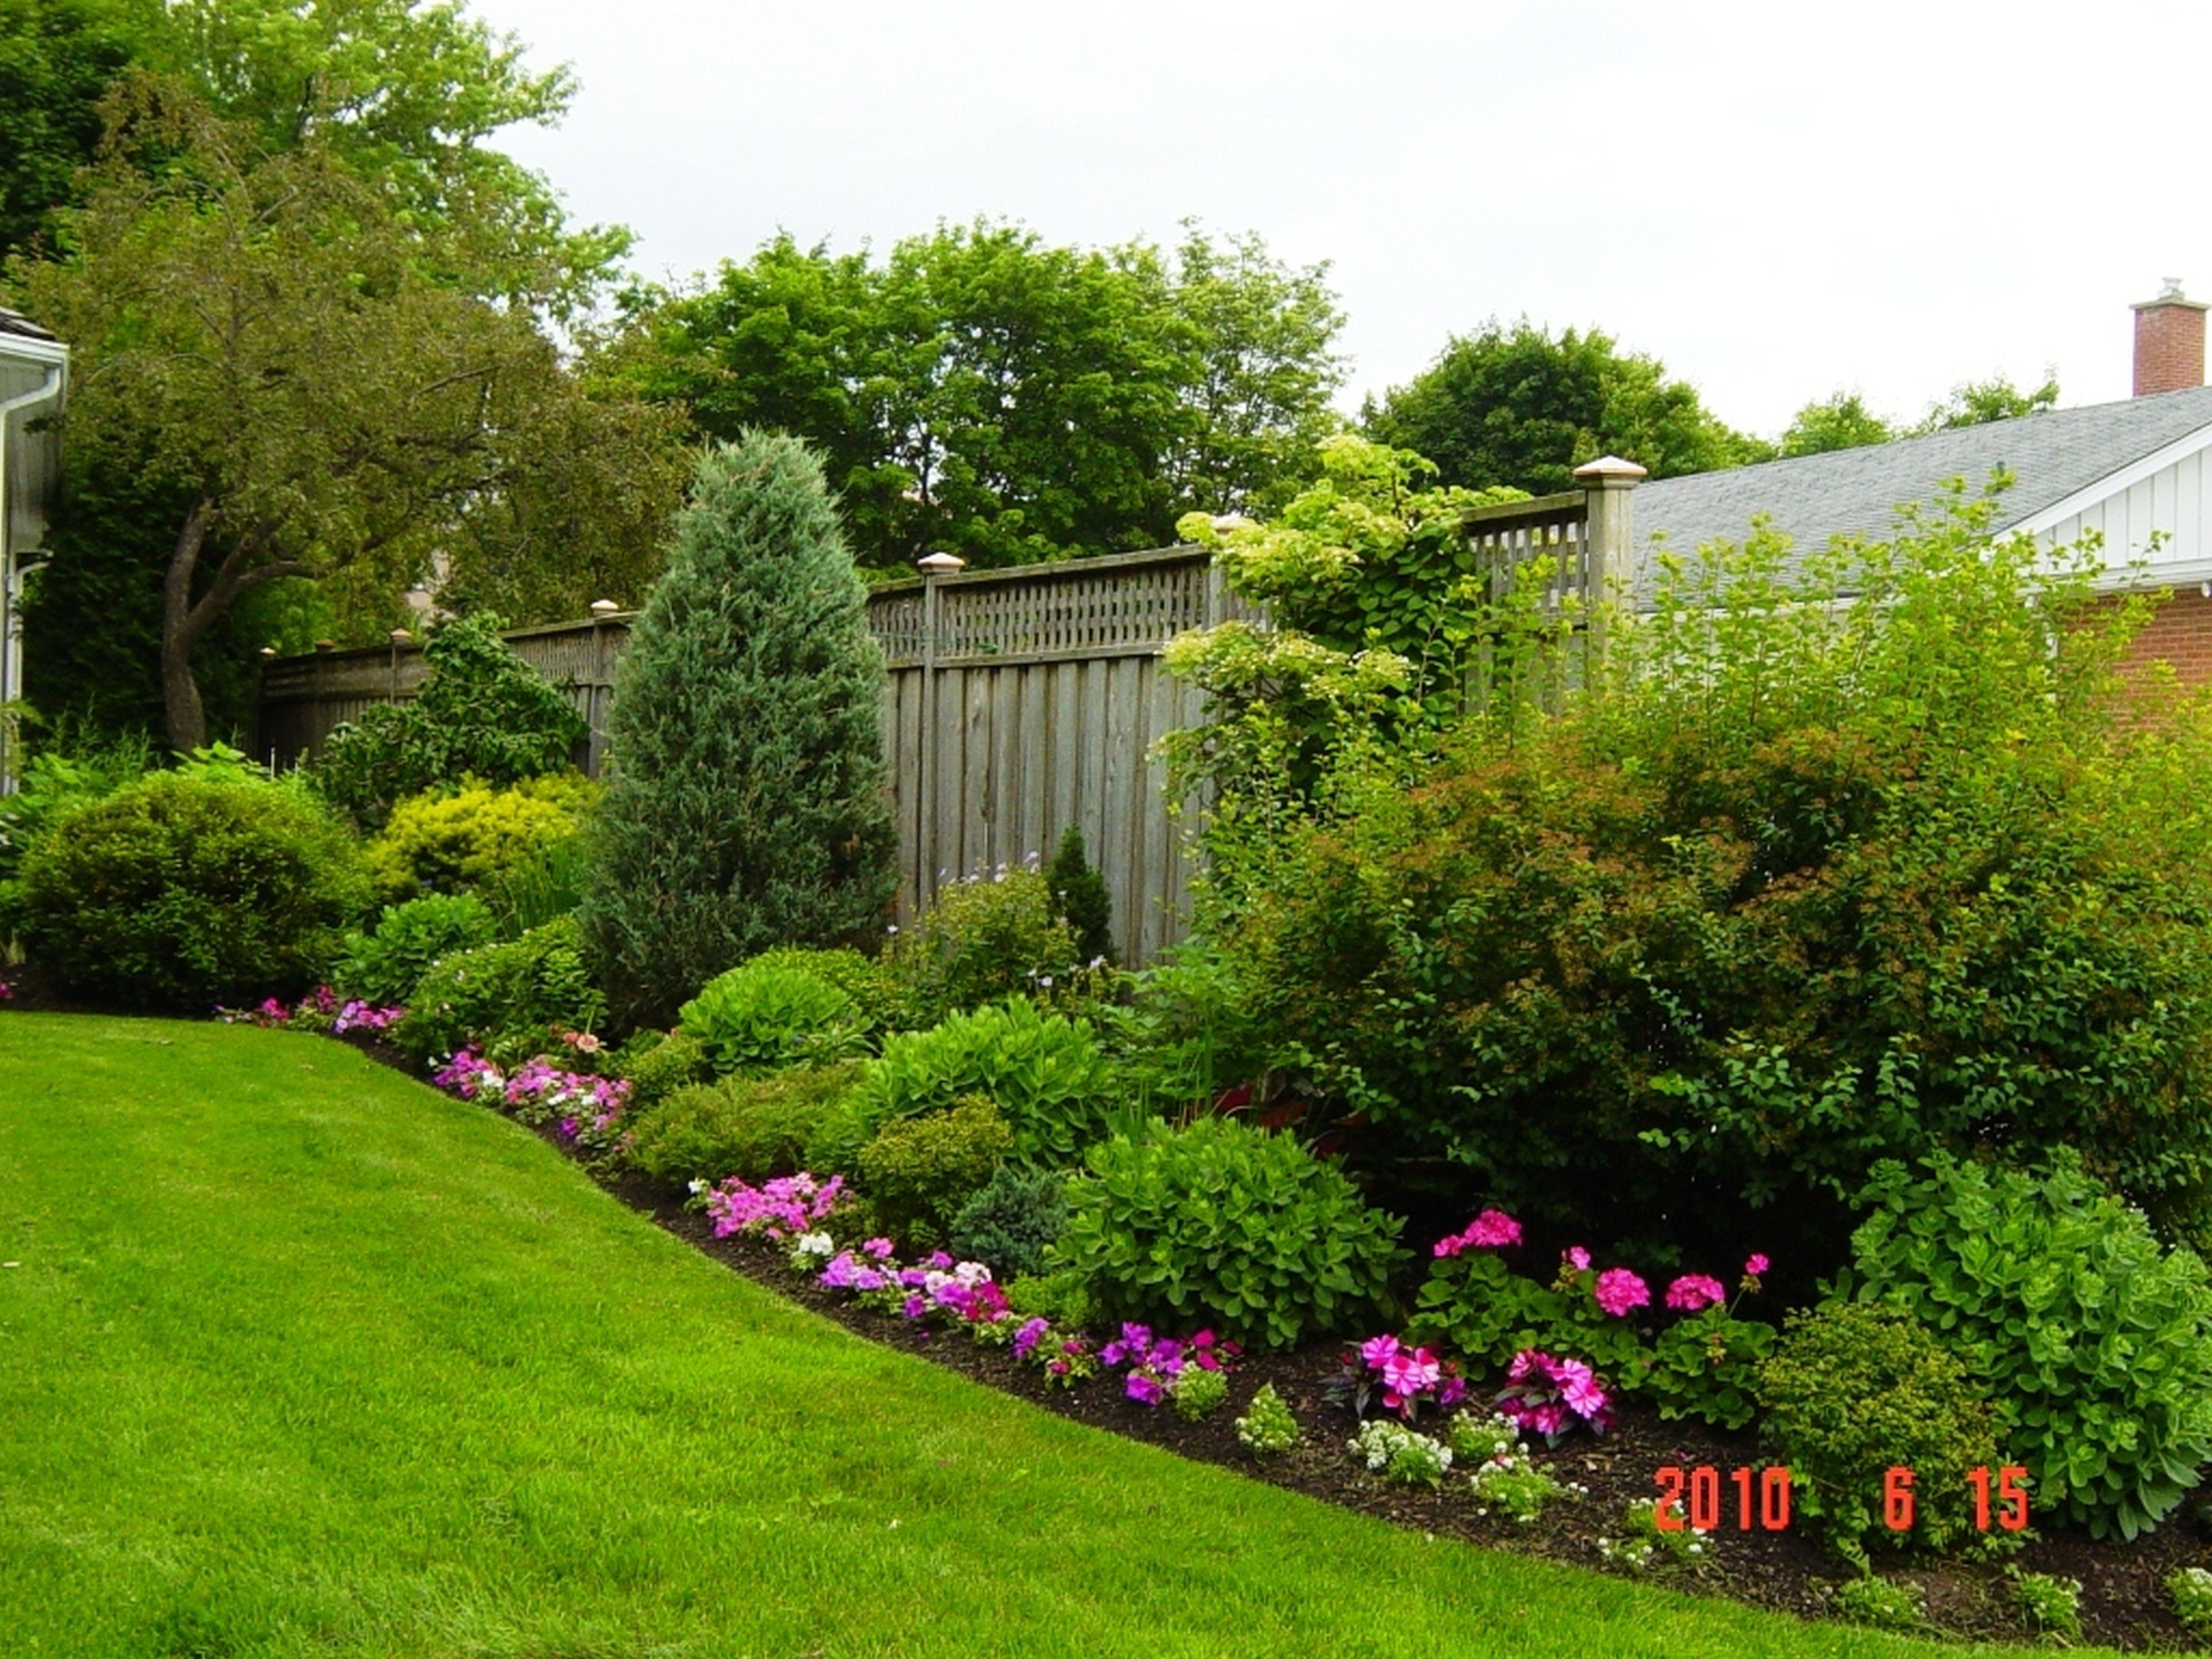 Backyard Fencing Ideas - HomesFeed on Backyard Wooden Fence Decorating Ideas id=25880